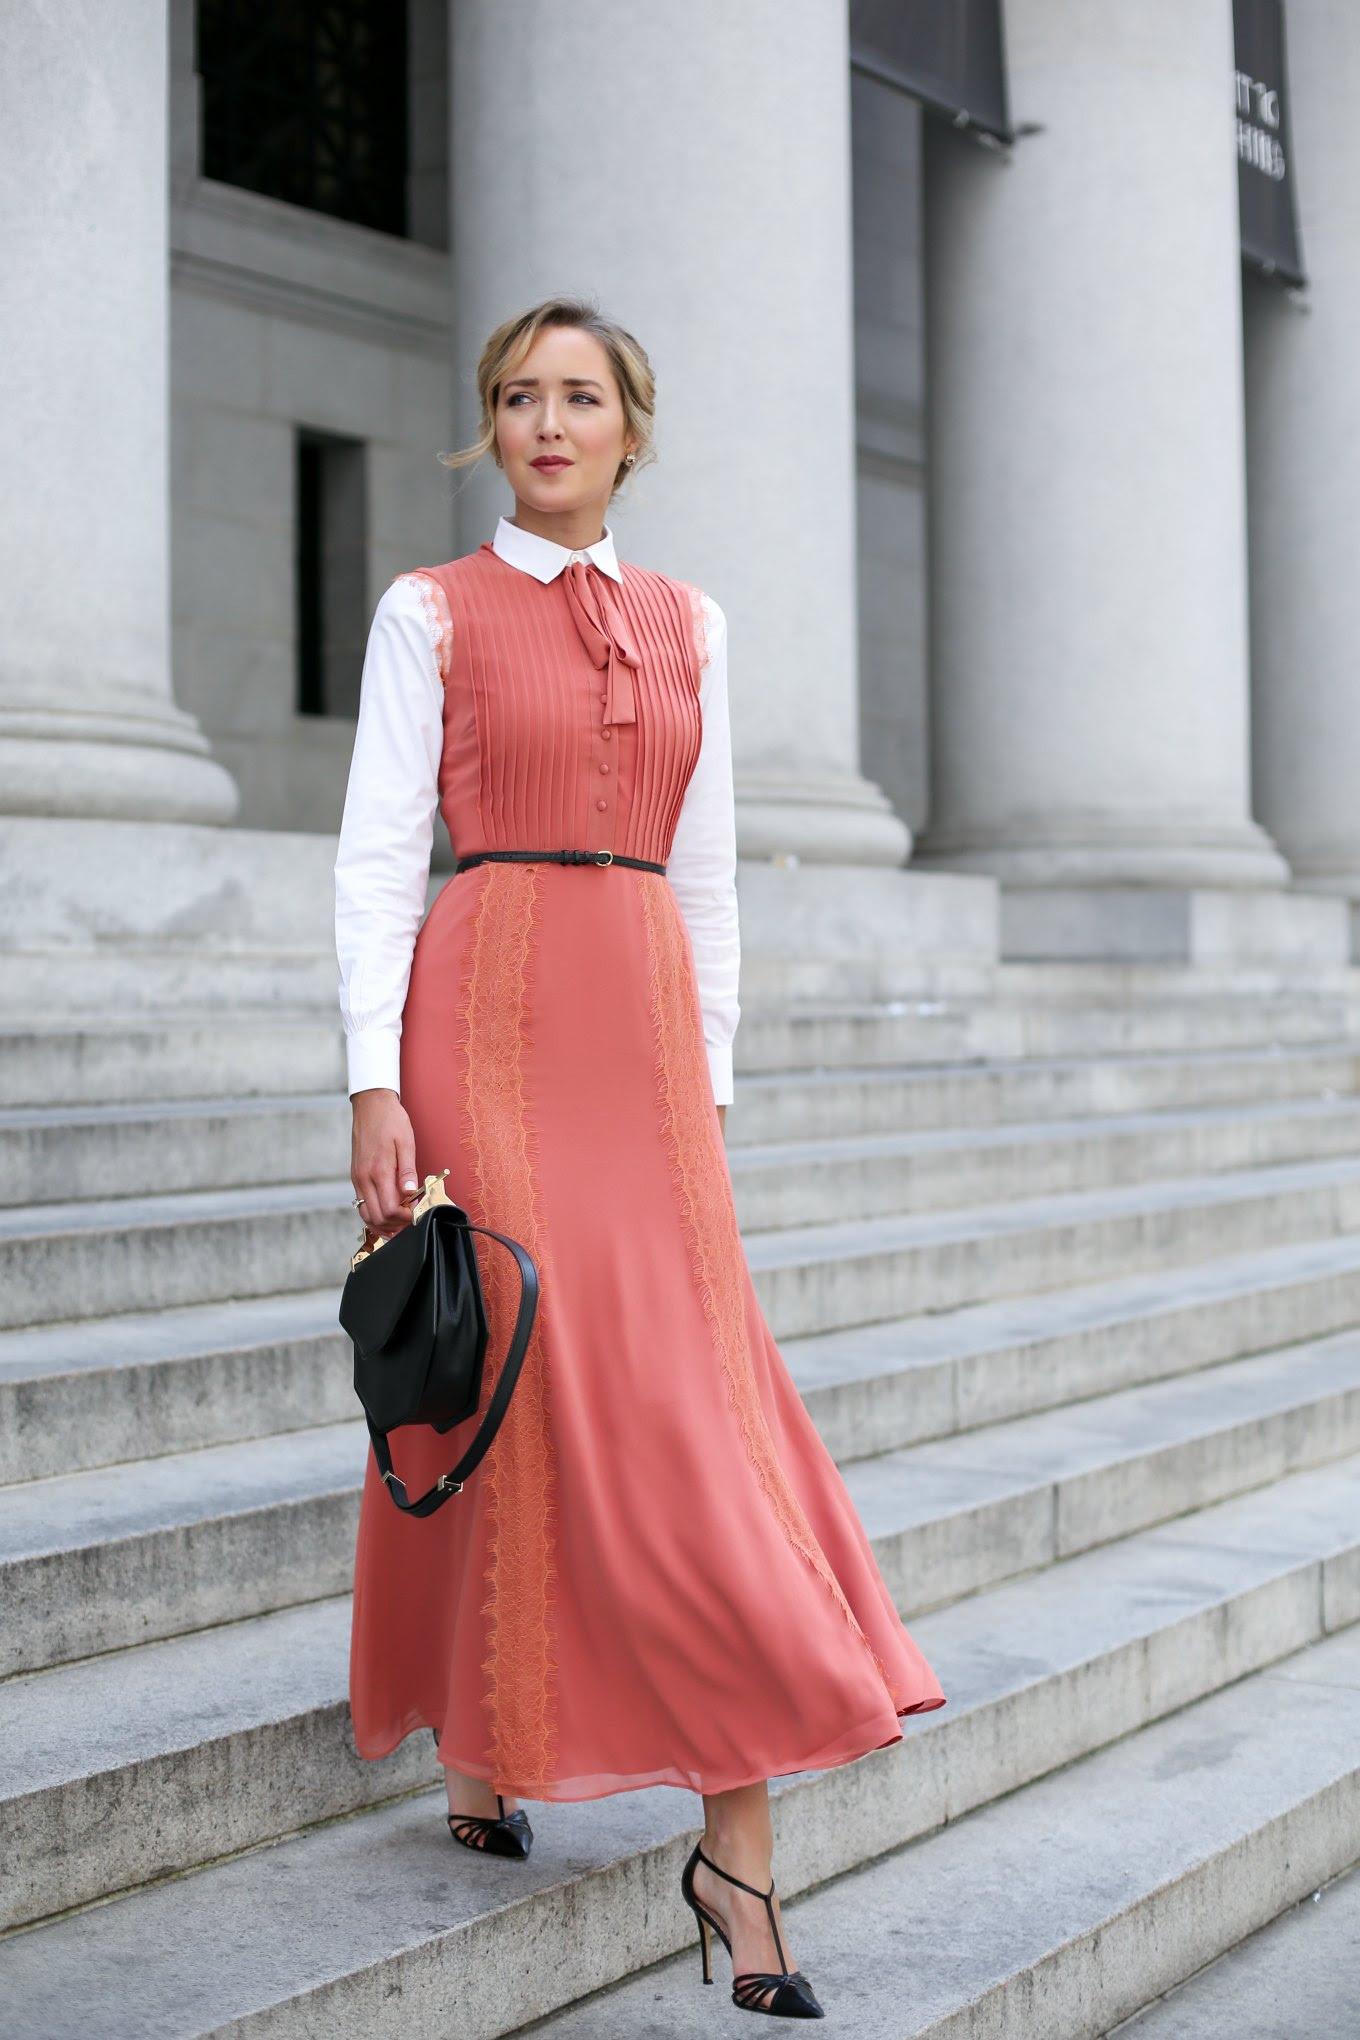 tularosa-peach-maxi-lace-bohemian-dress-neck-tie-layered-collared-button-down-shirt-professional-work-wear-office-style-fashion-blog-san-francisco-mary-orton2